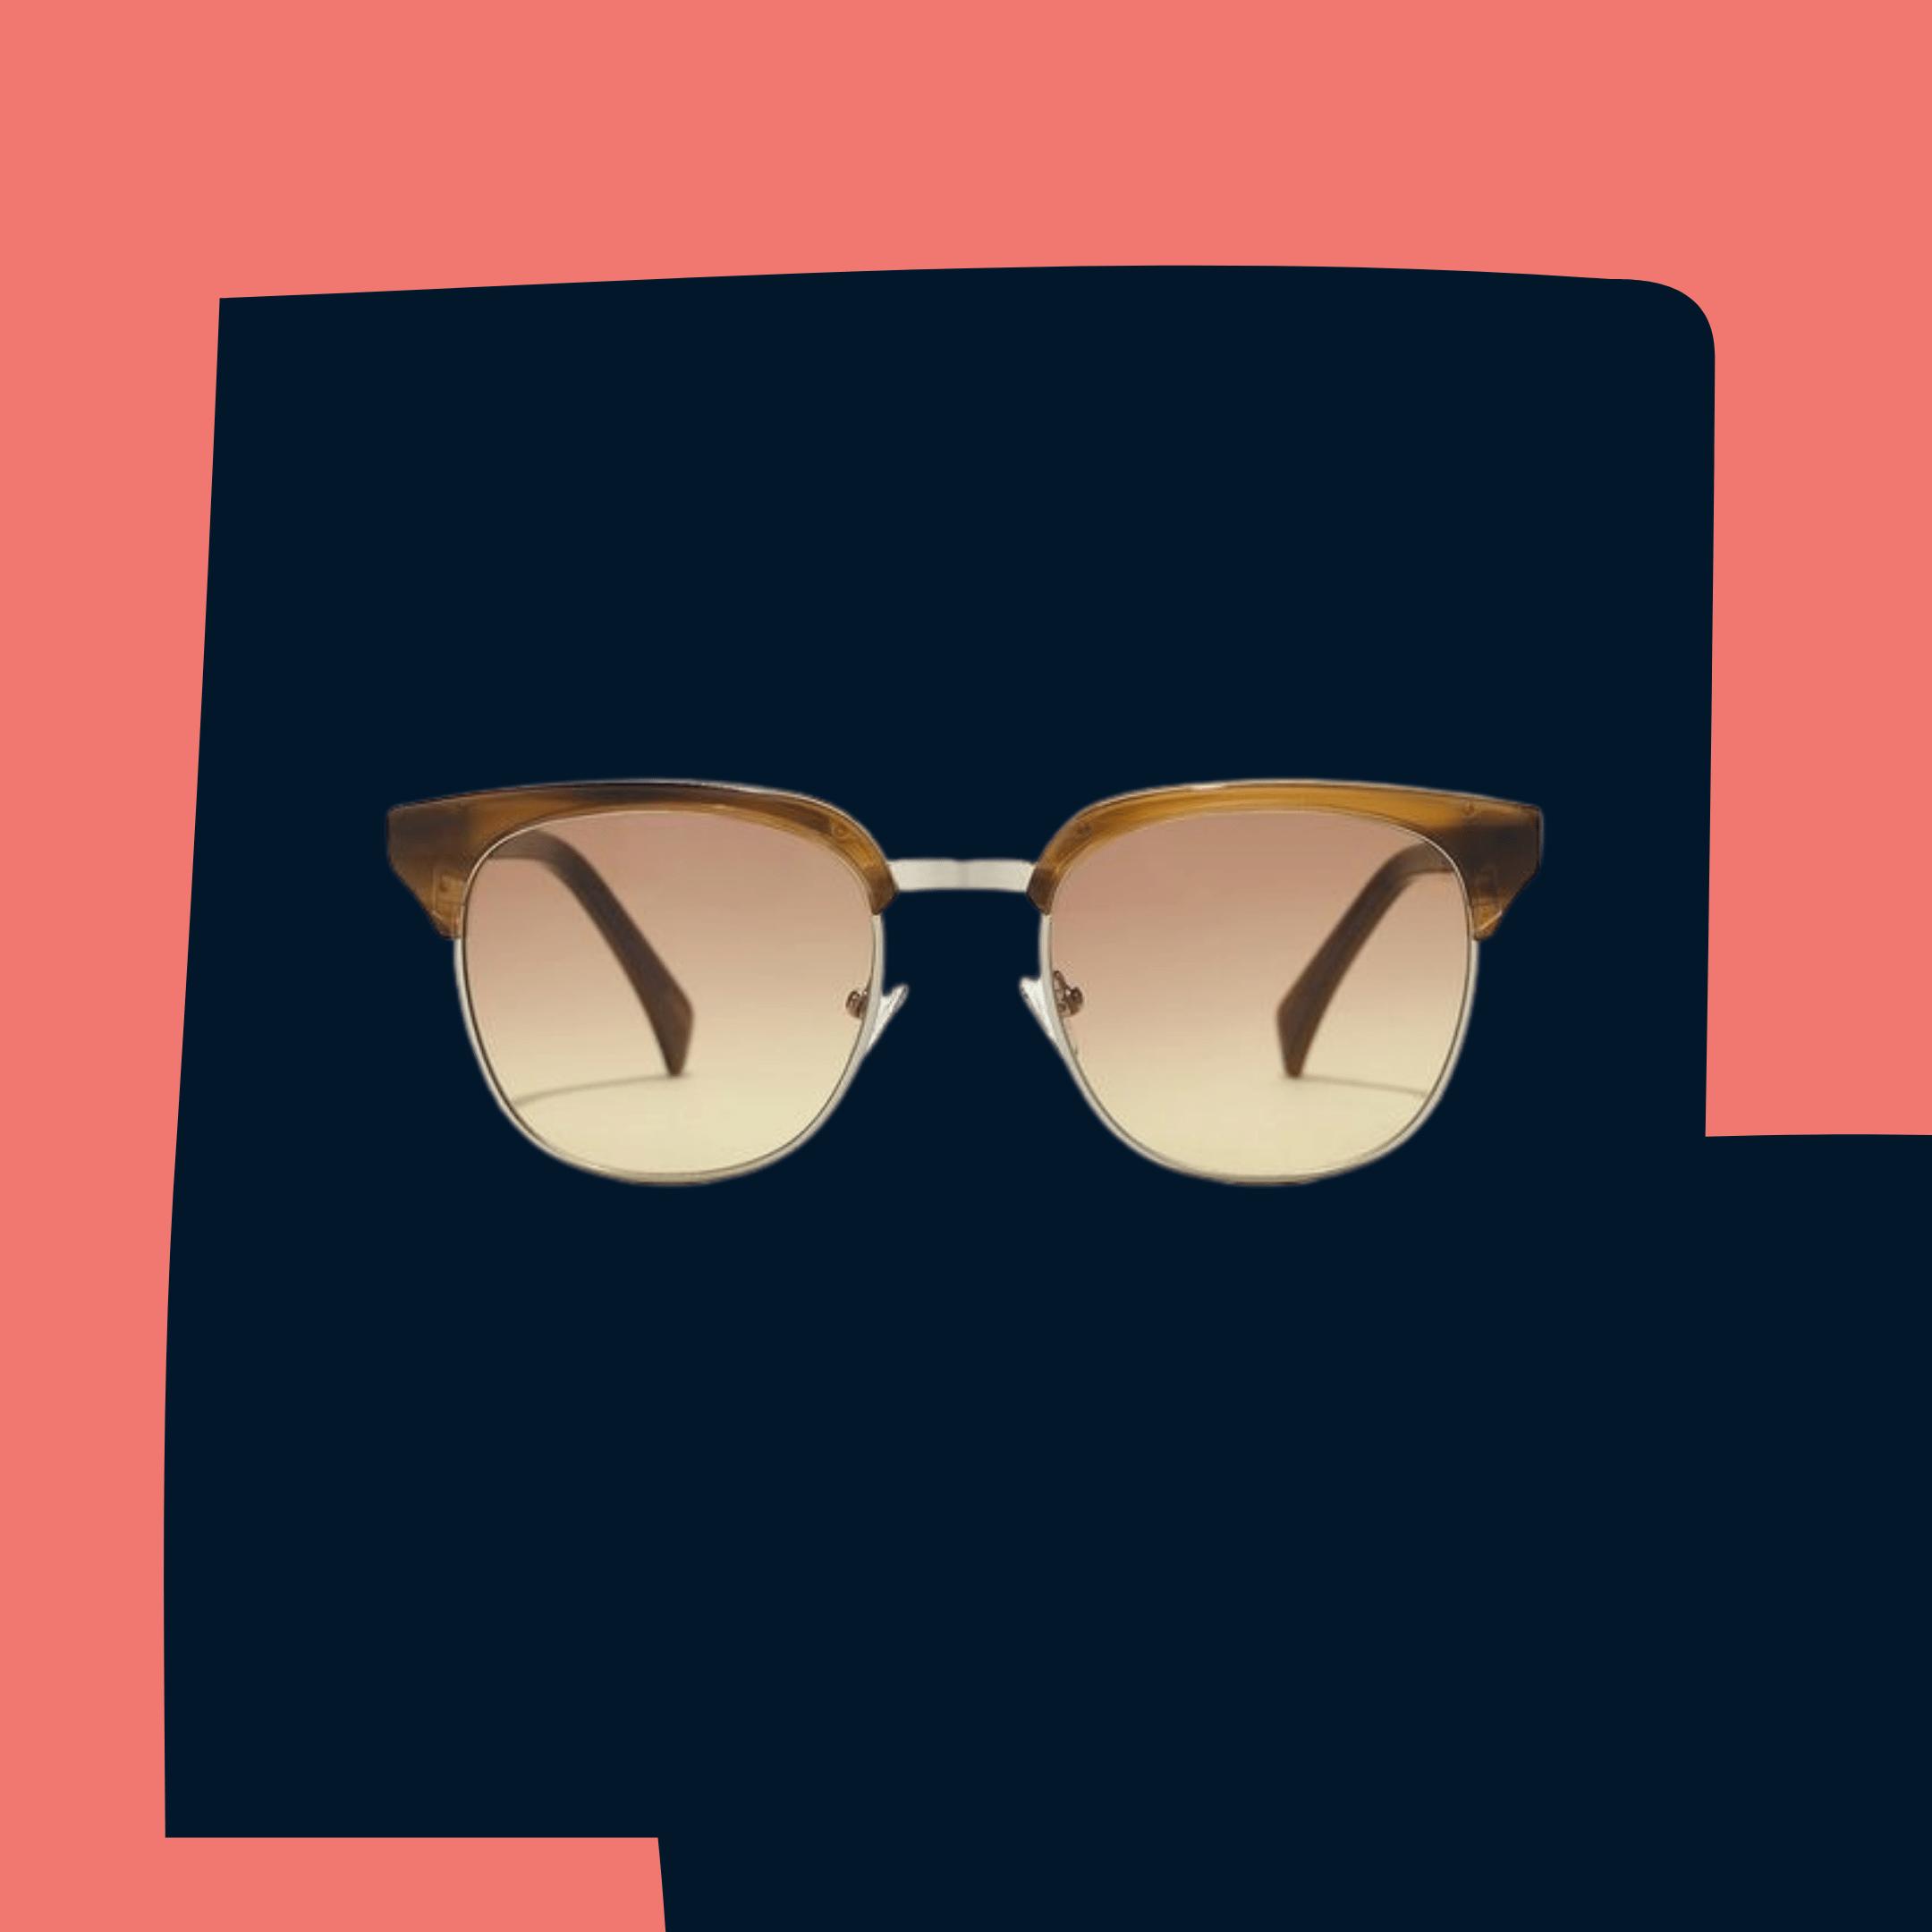 j.crew whitecap sunglasses